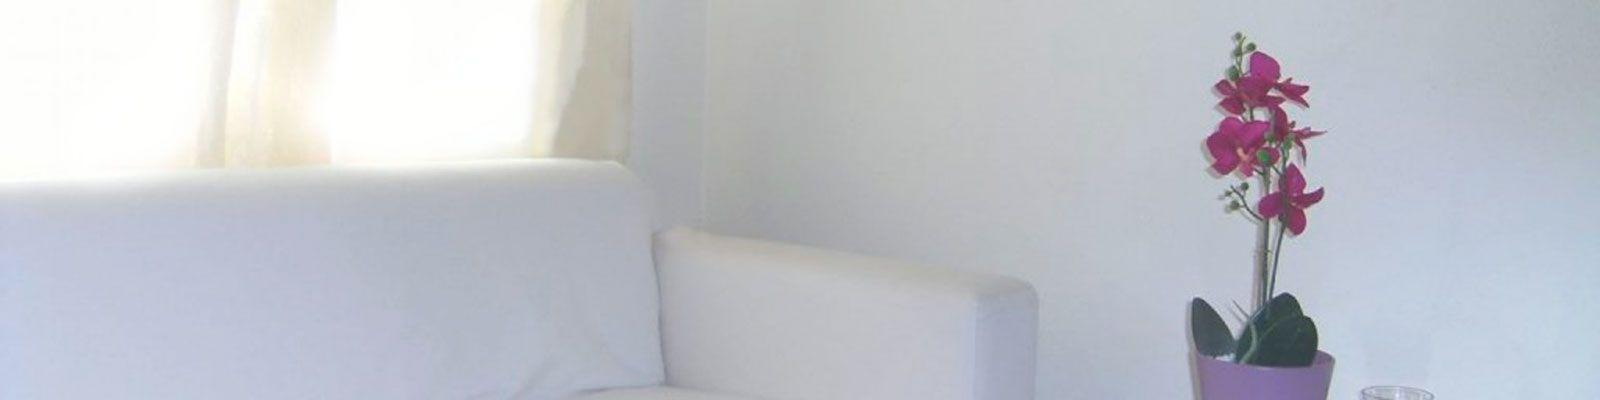 Psicologa en Zaragoza. Consulta de psicologia de Marta Nieto.